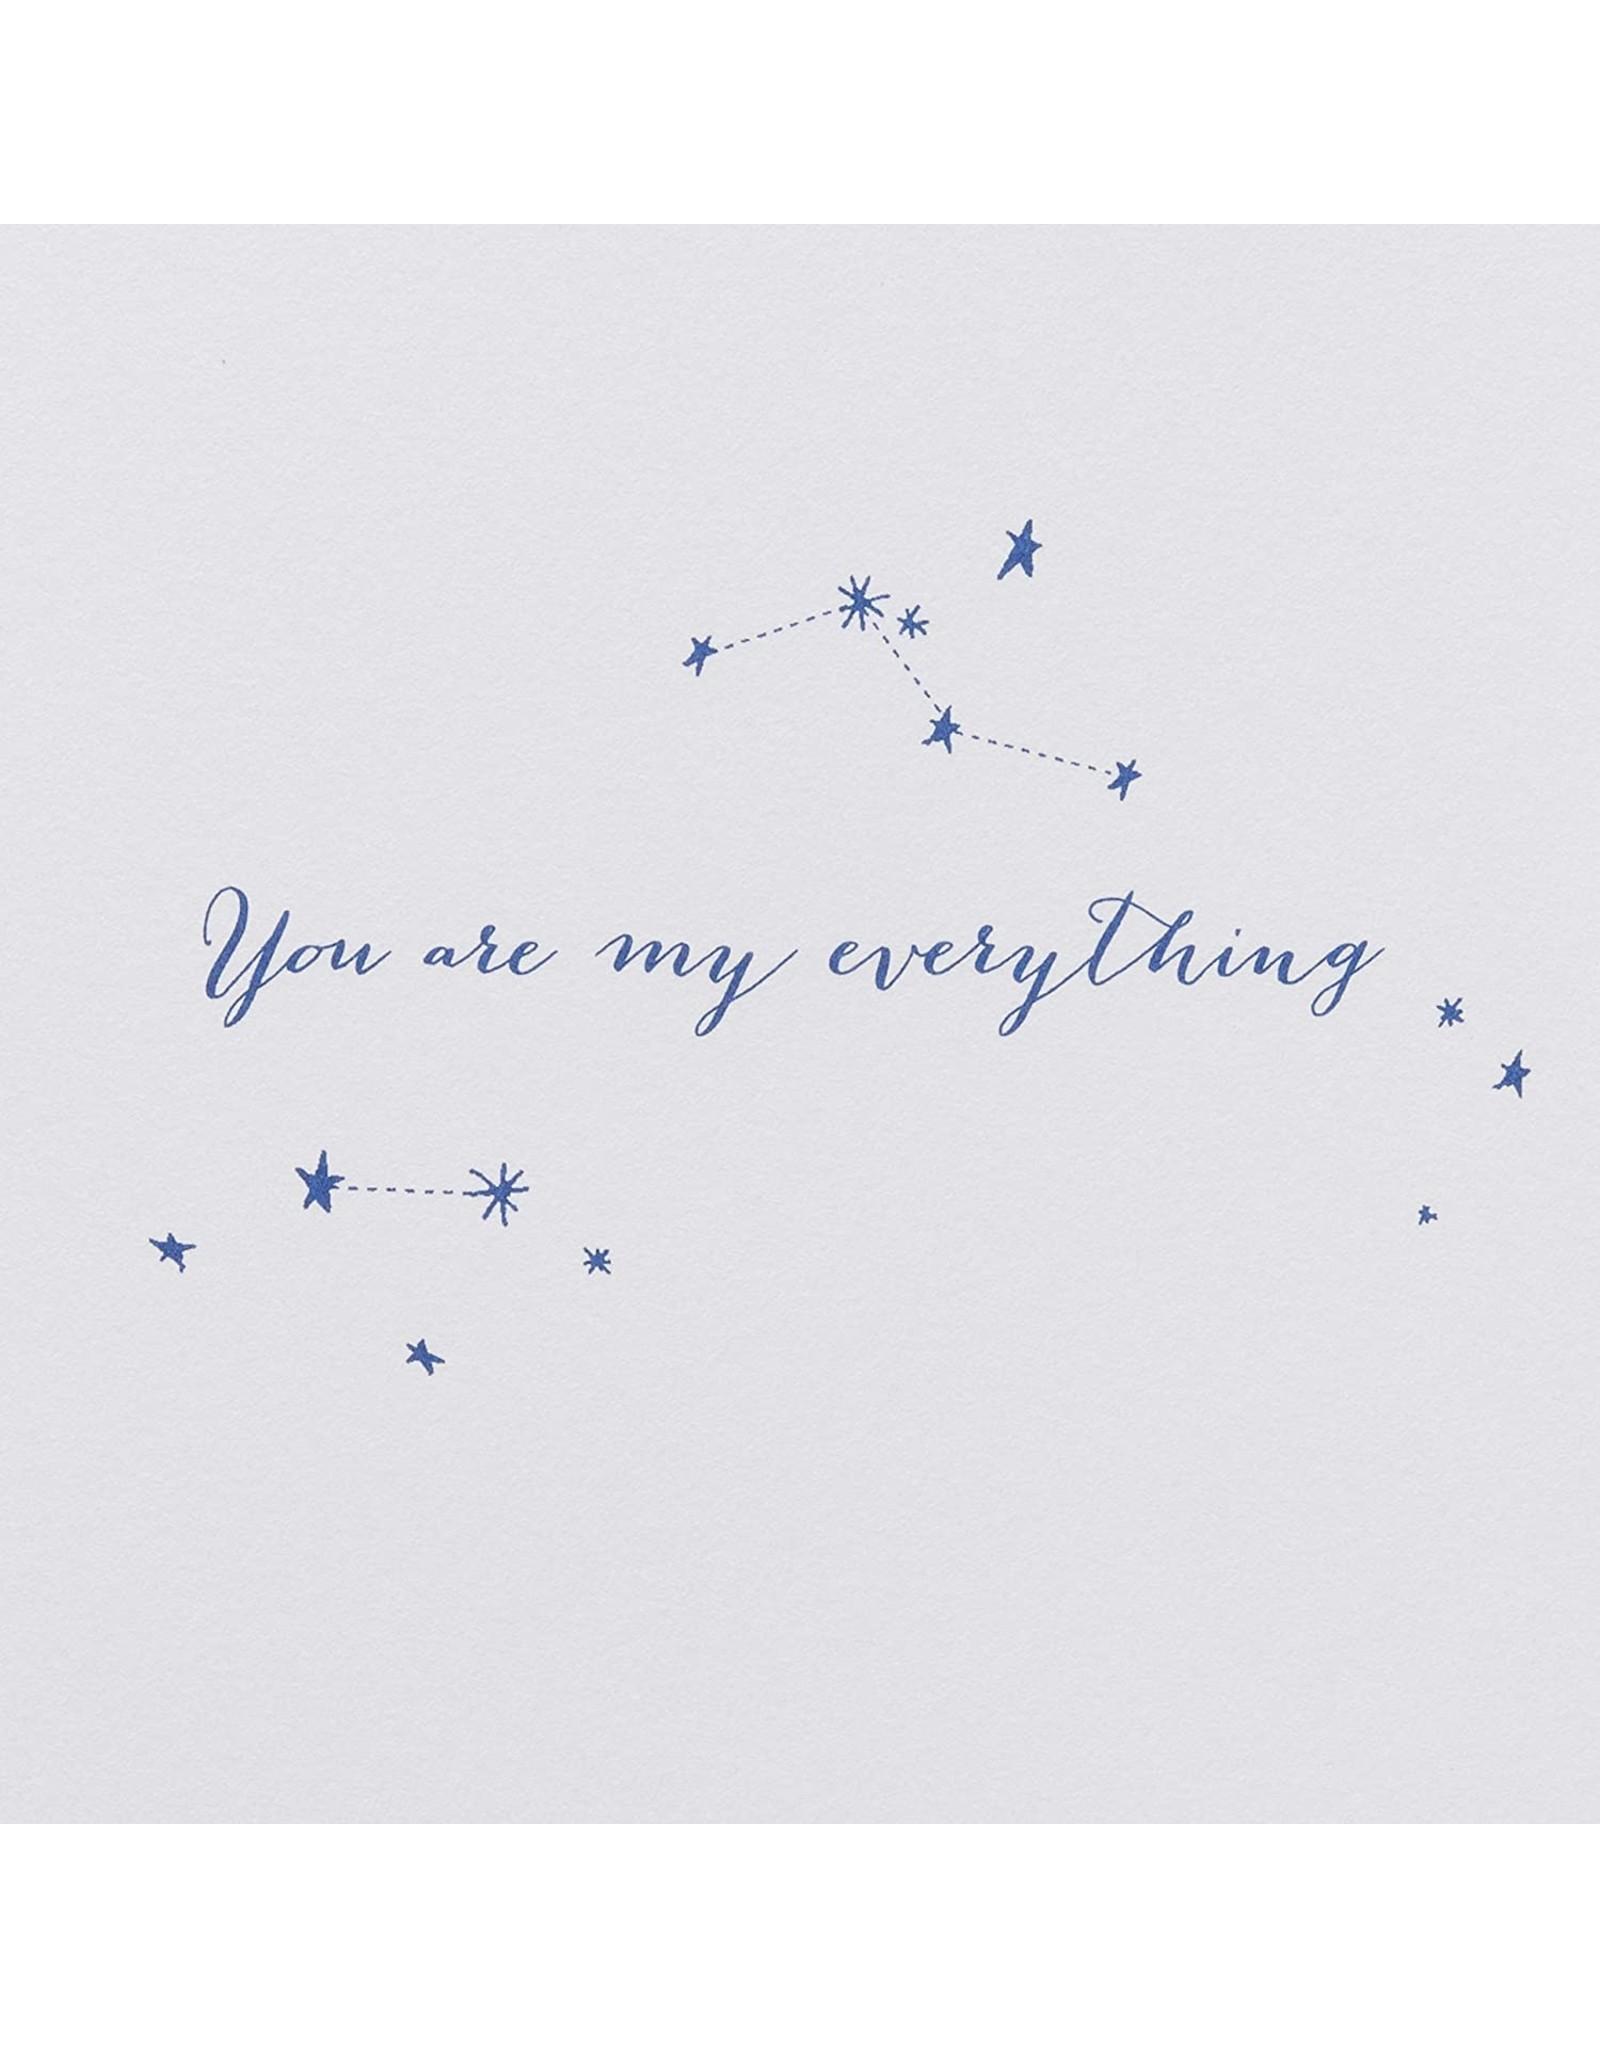 PAPYRUS® Anniversary Card Elegant Star Quote